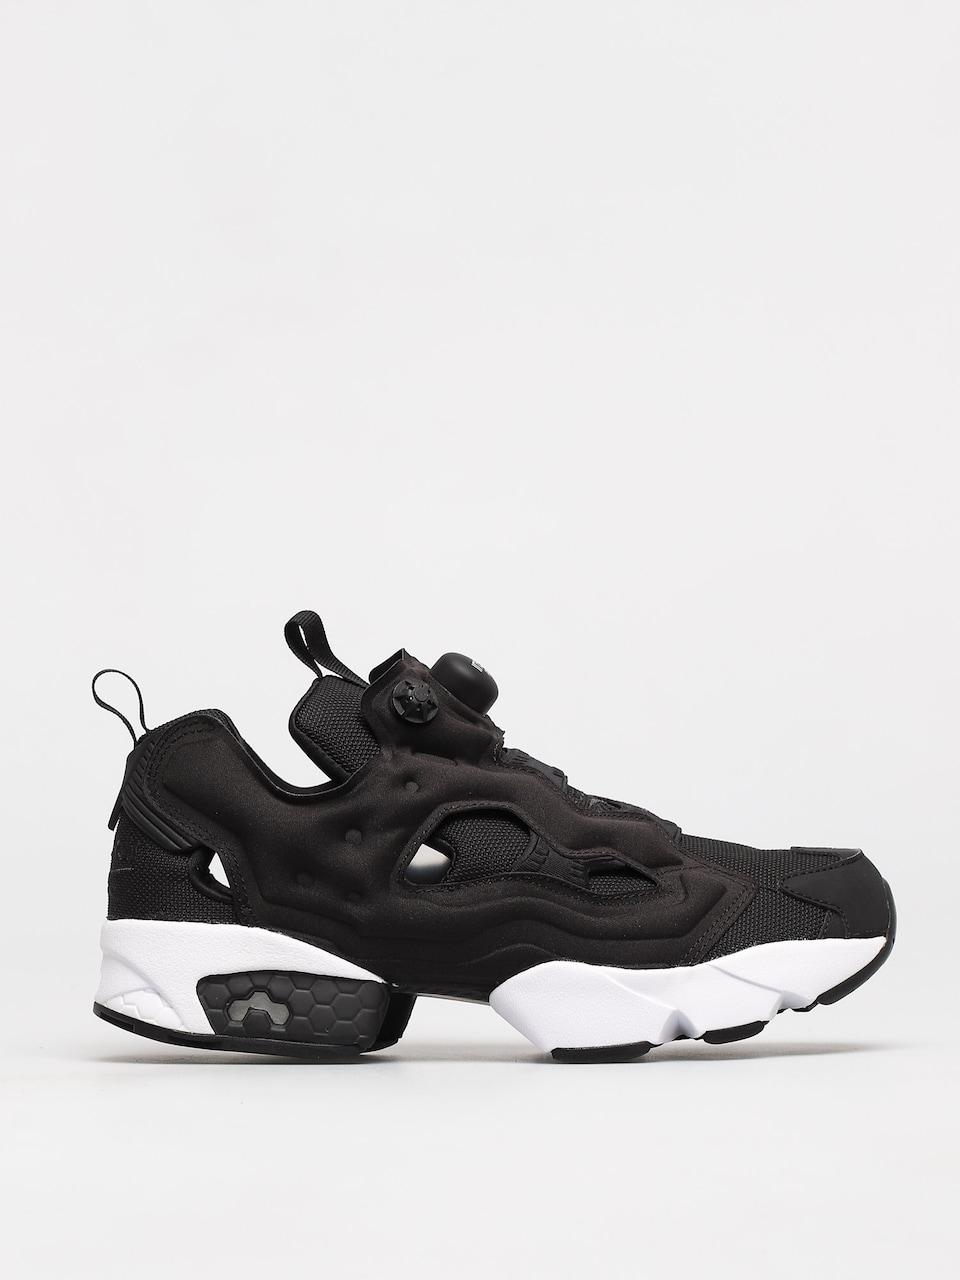 Extranjero espacio Genuino  Reebok Instapump Fury Og Shoes (black/white)